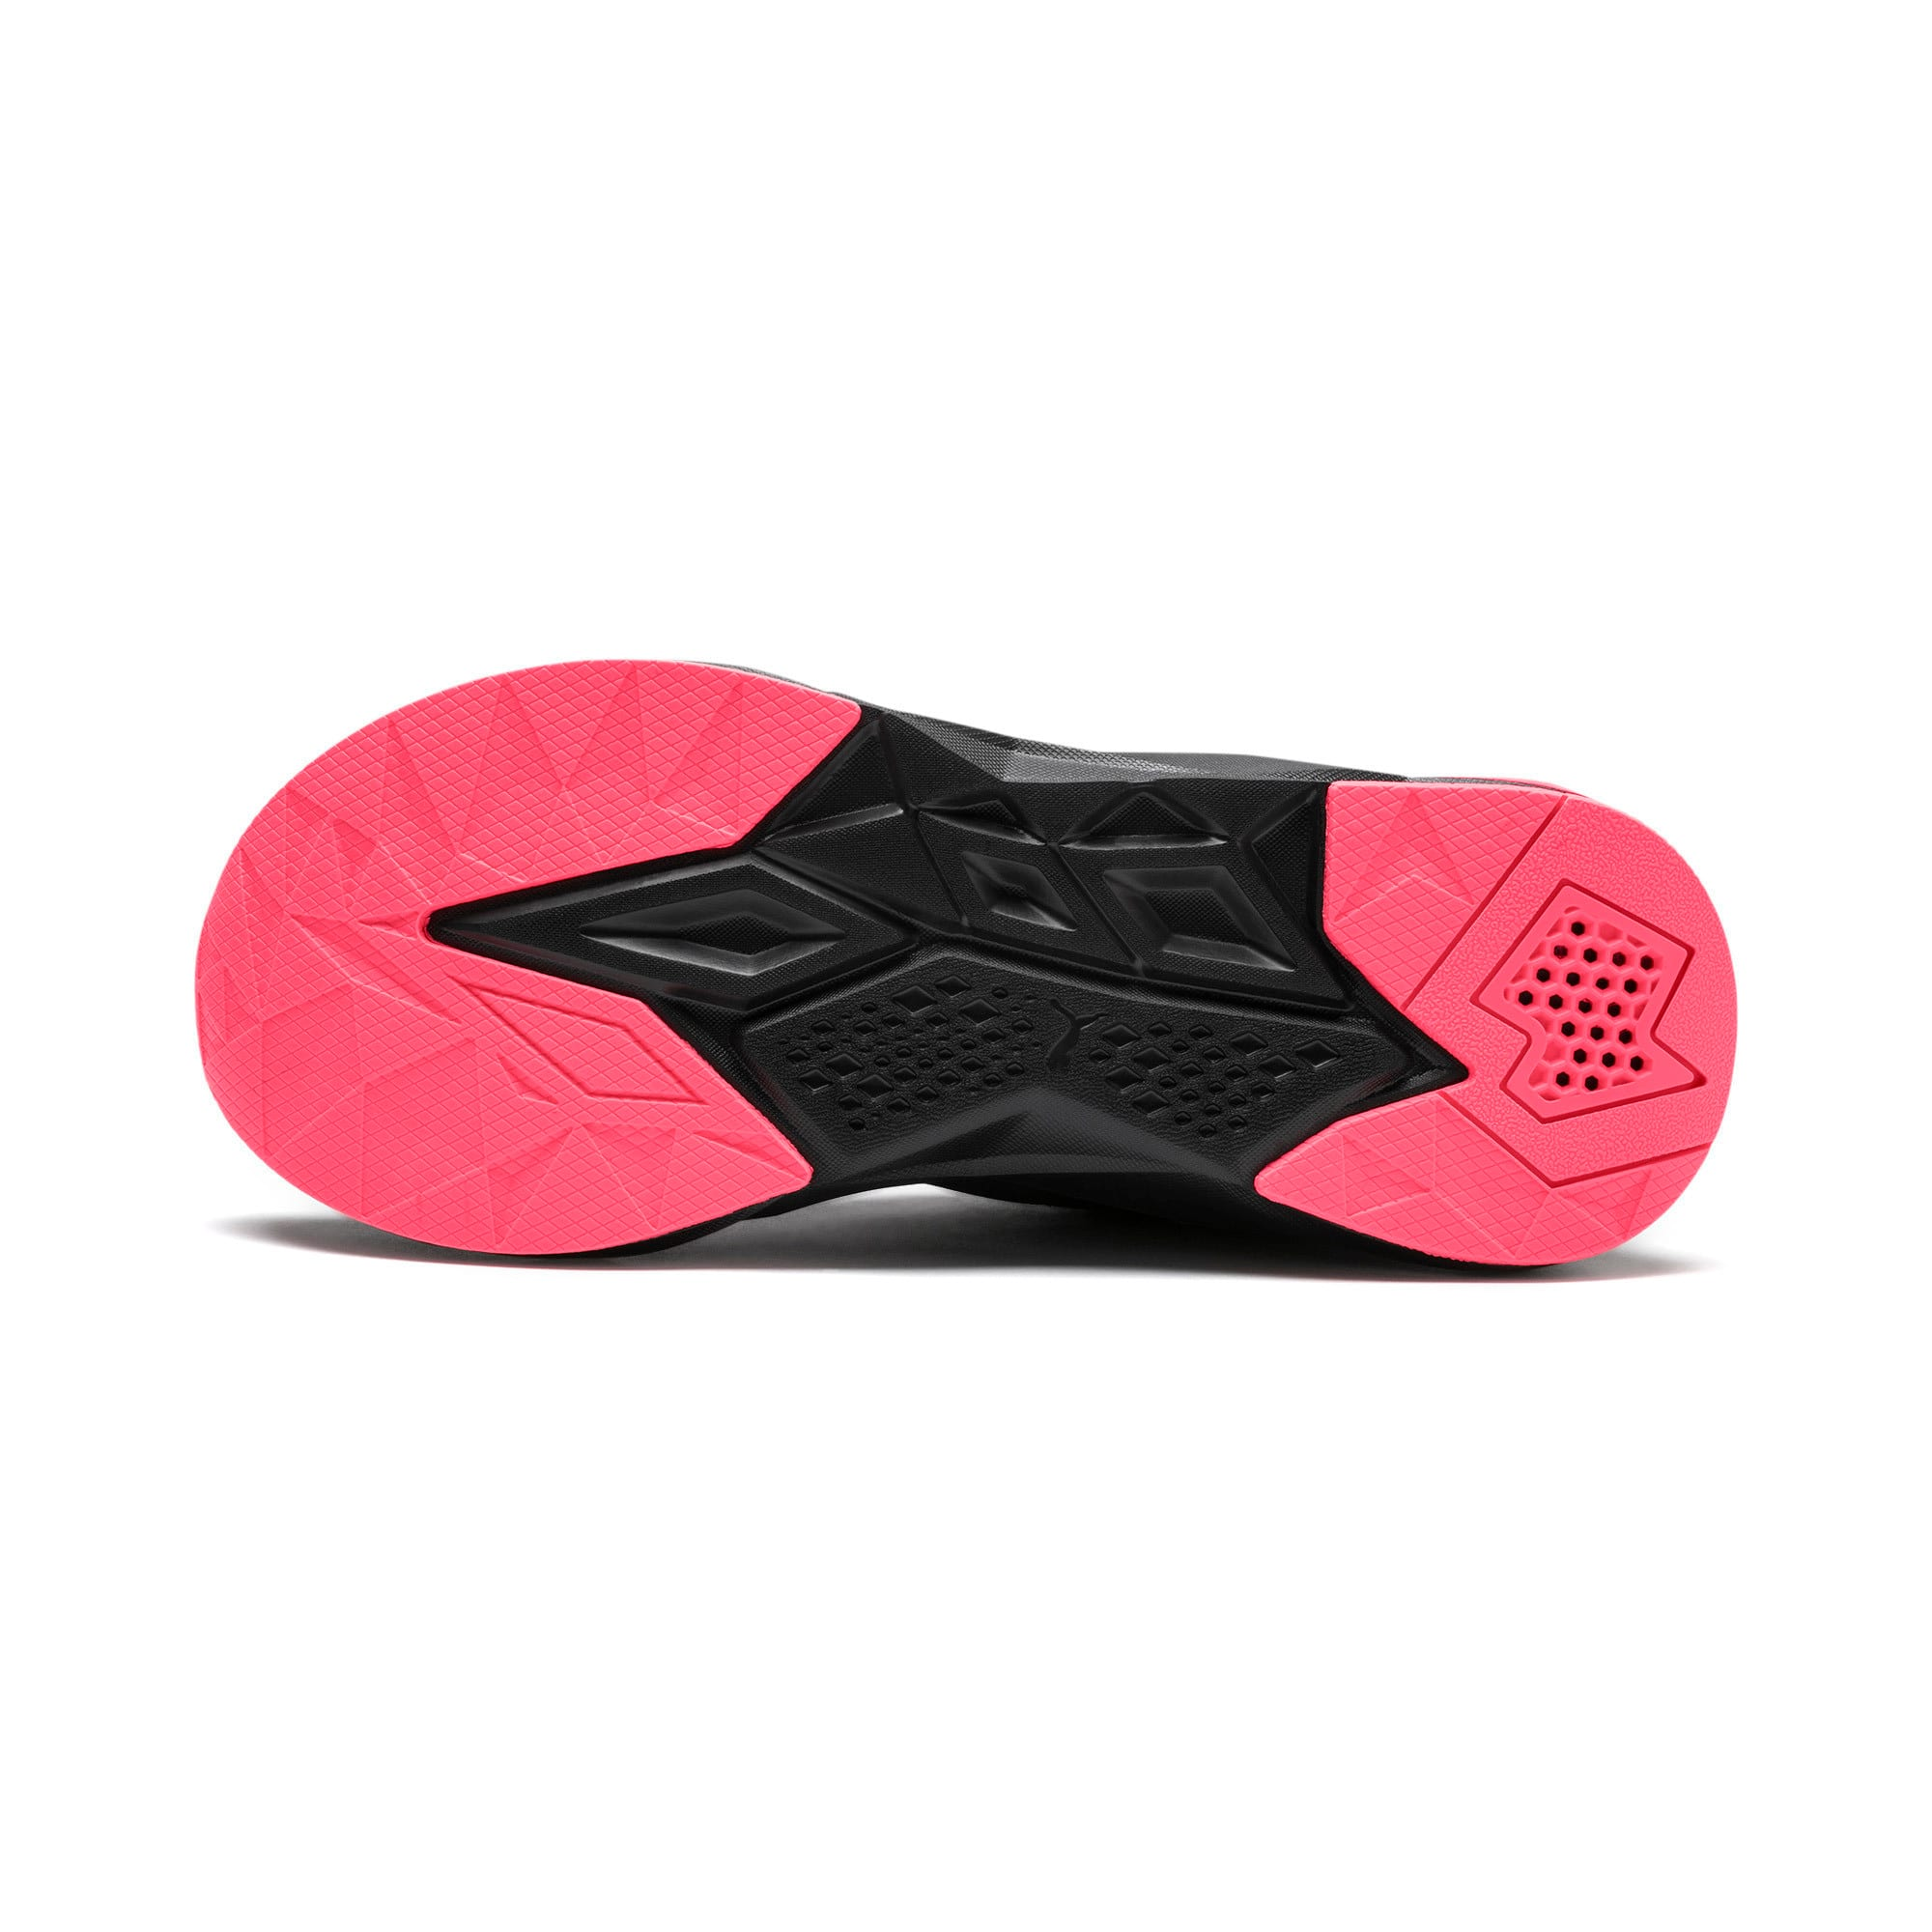 Thumbnail 4 of CELL Plasmic Fluorescent Women's Training Shoes, Puma Black-Pink Alert, medium